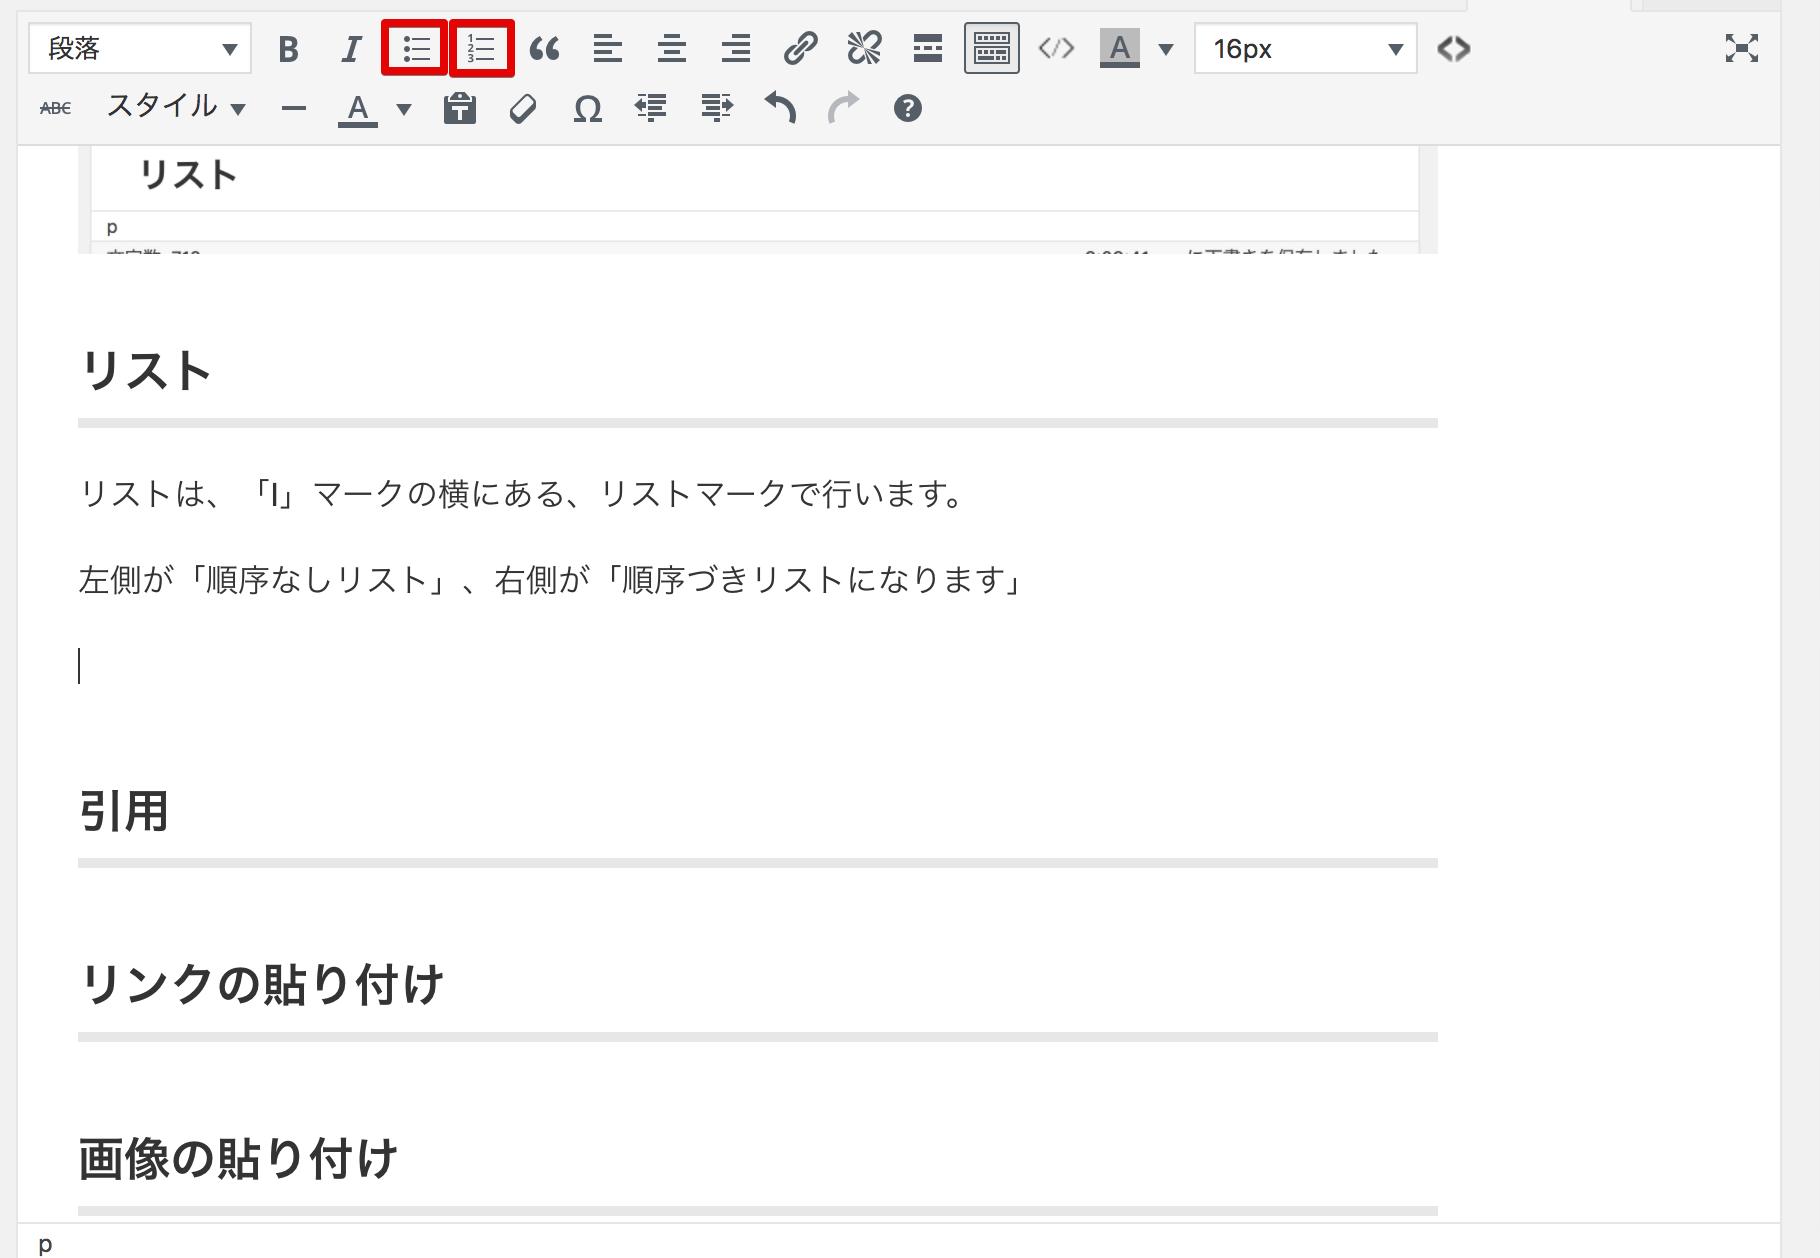 2671500144113dba5a047bc160840ce6 - 初心者向け!WordPressの投稿方法や記事の編集方法を徹底解説